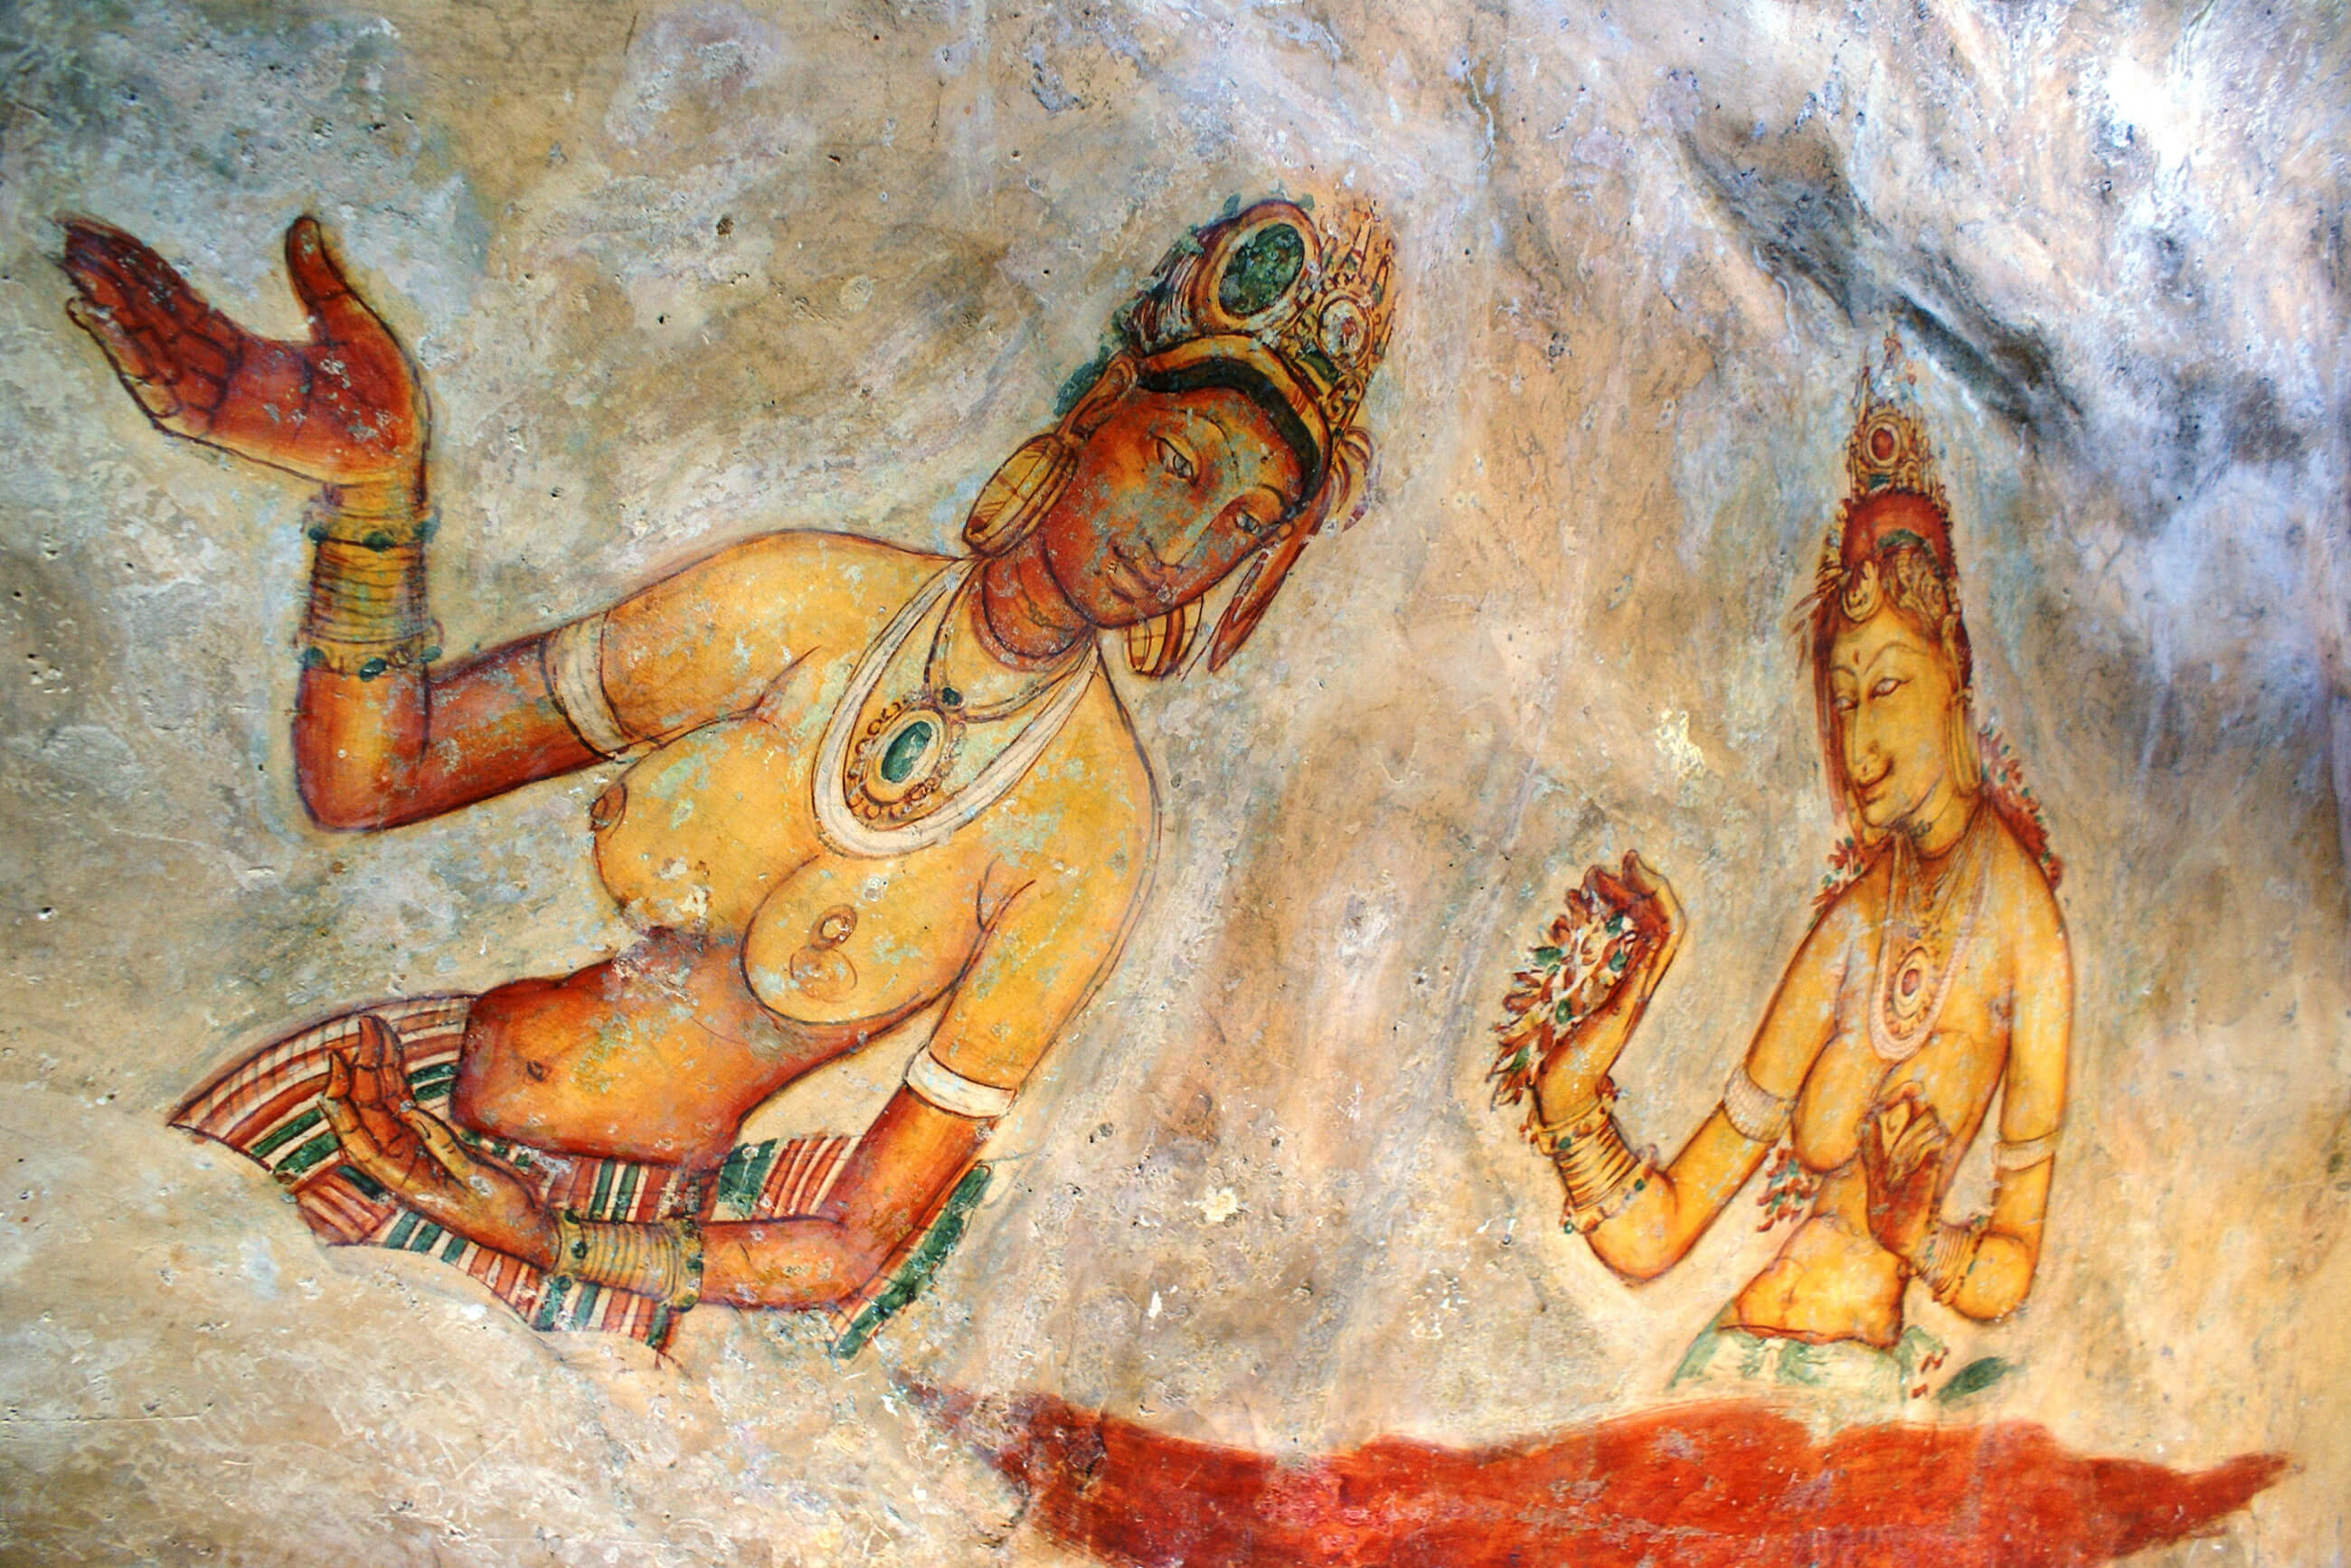 https://bubo.sk/uploads/galleries/5058/archiv_srilanka_sri-lanka-fam-marec-2009-196.jpg